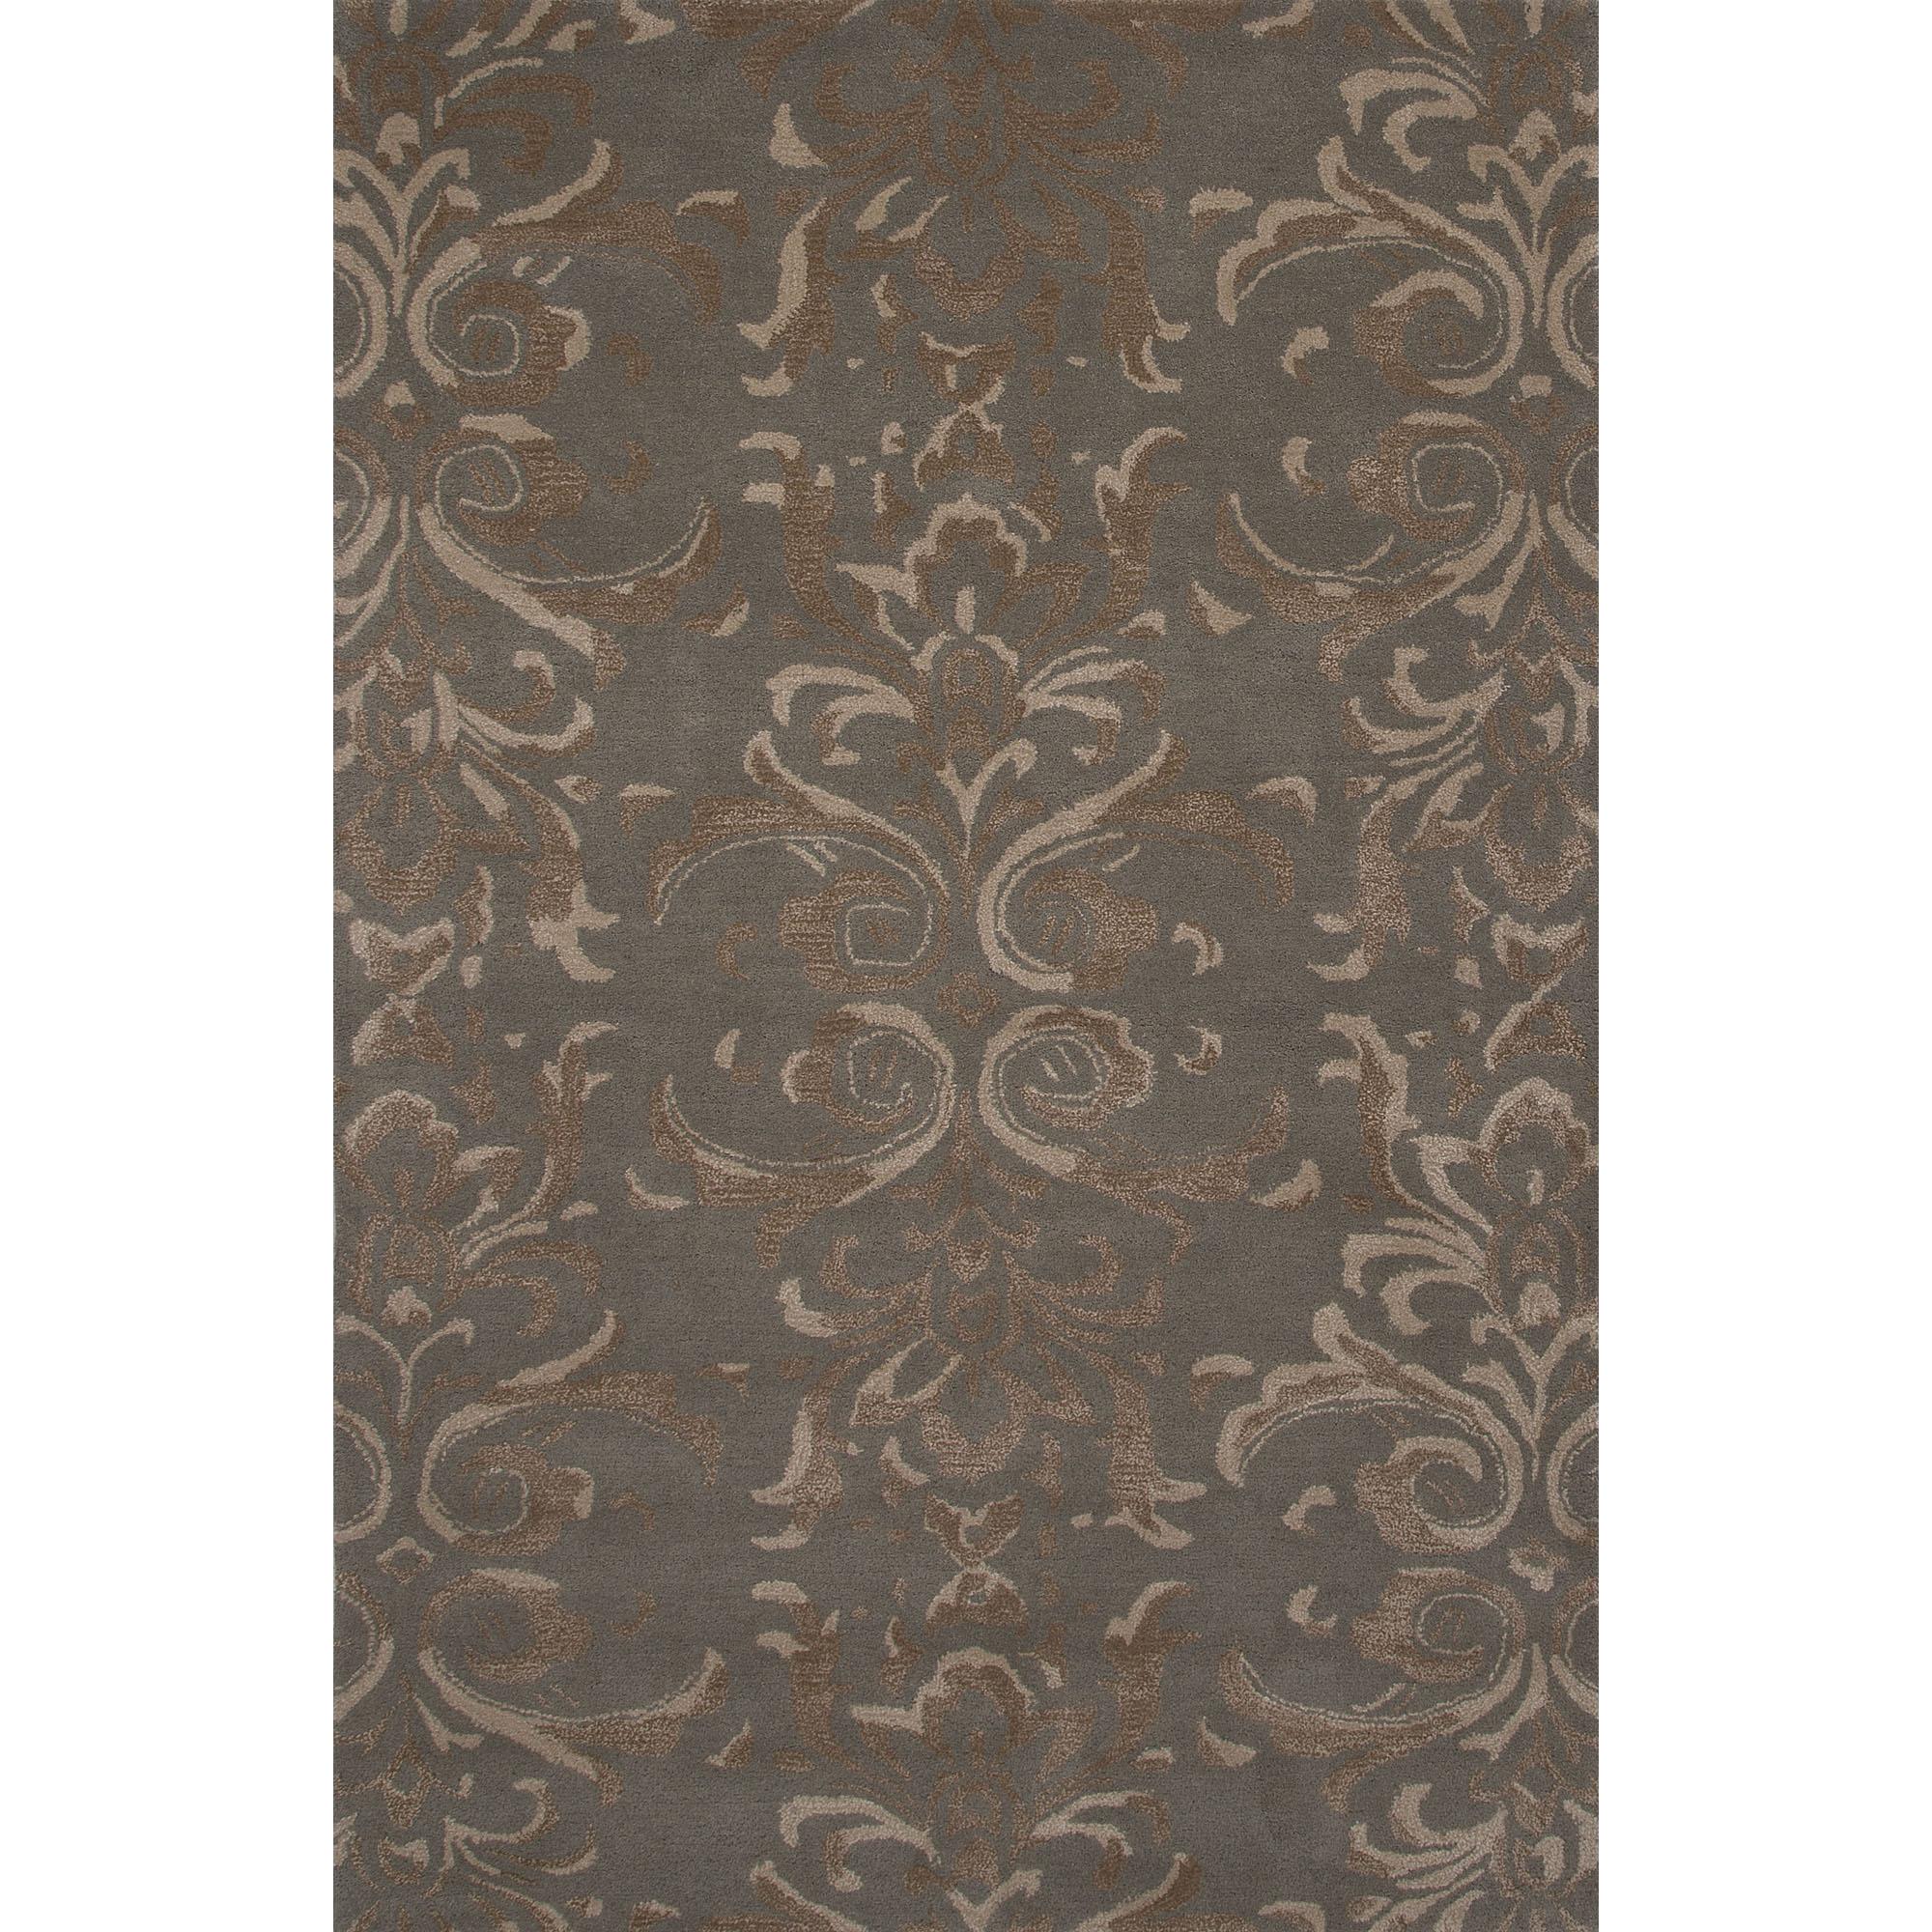 JAIPUR Rugs Timeless By Jennifer Adams Tufted 2 x 3 Rug - Item Number: RUG122161